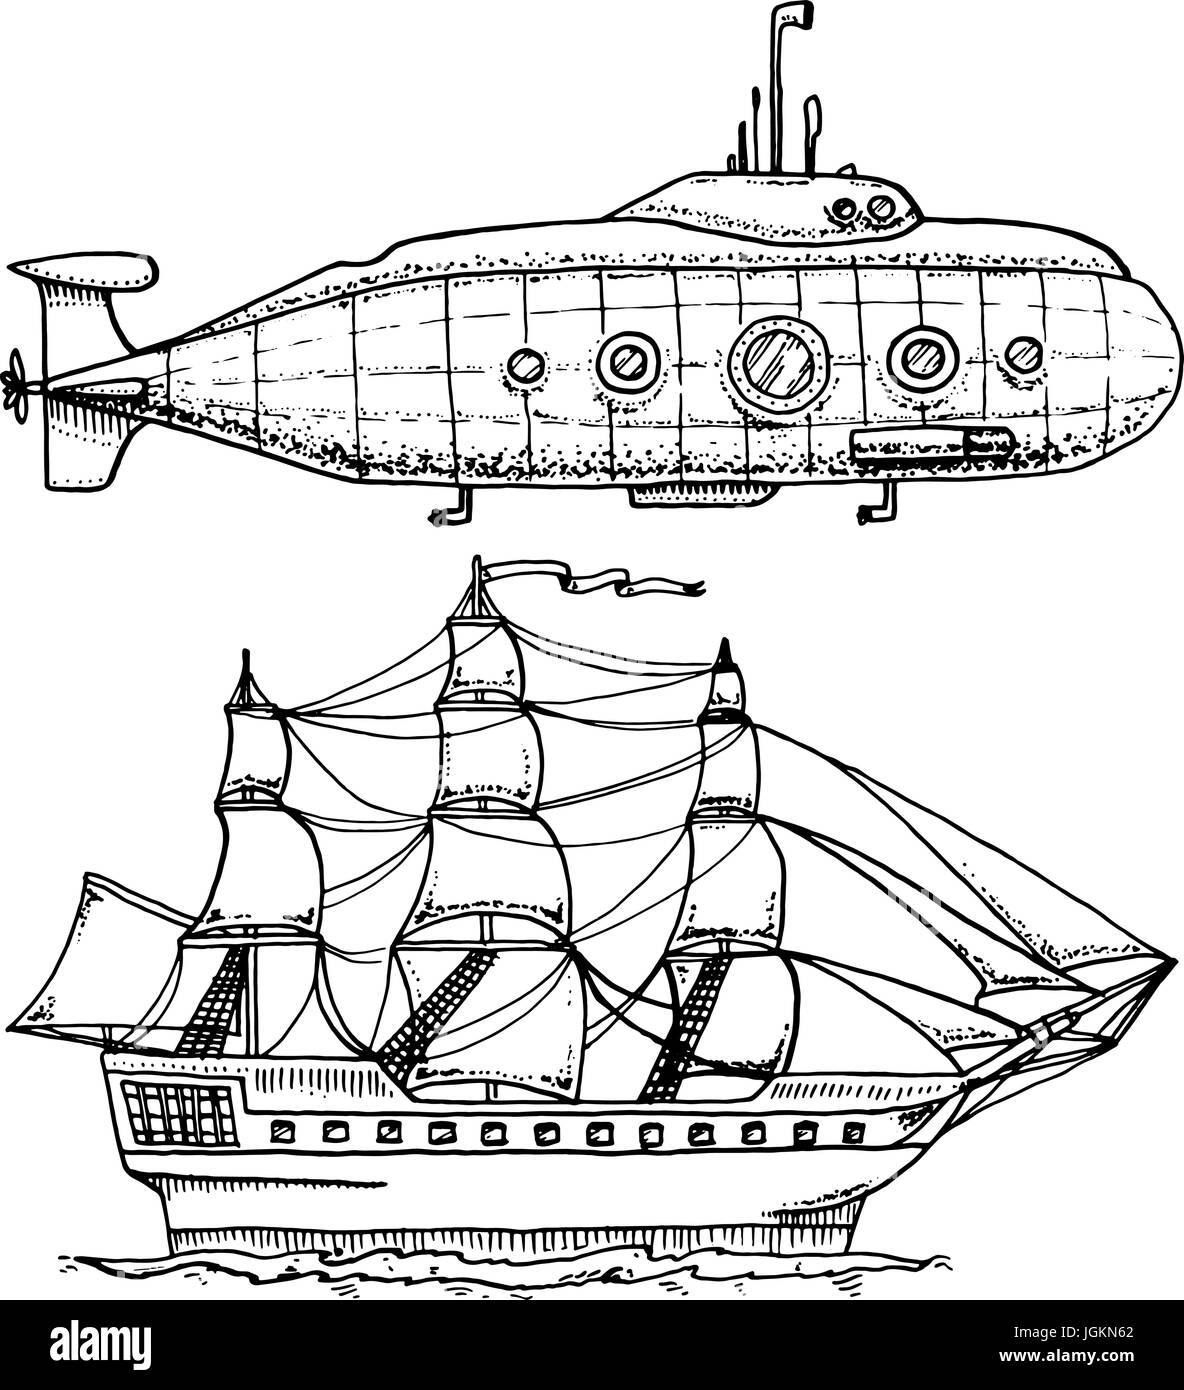 Cartoon Ship Sea Imágenes De Stock & Cartoon Ship Sea Fotos De Stock ...